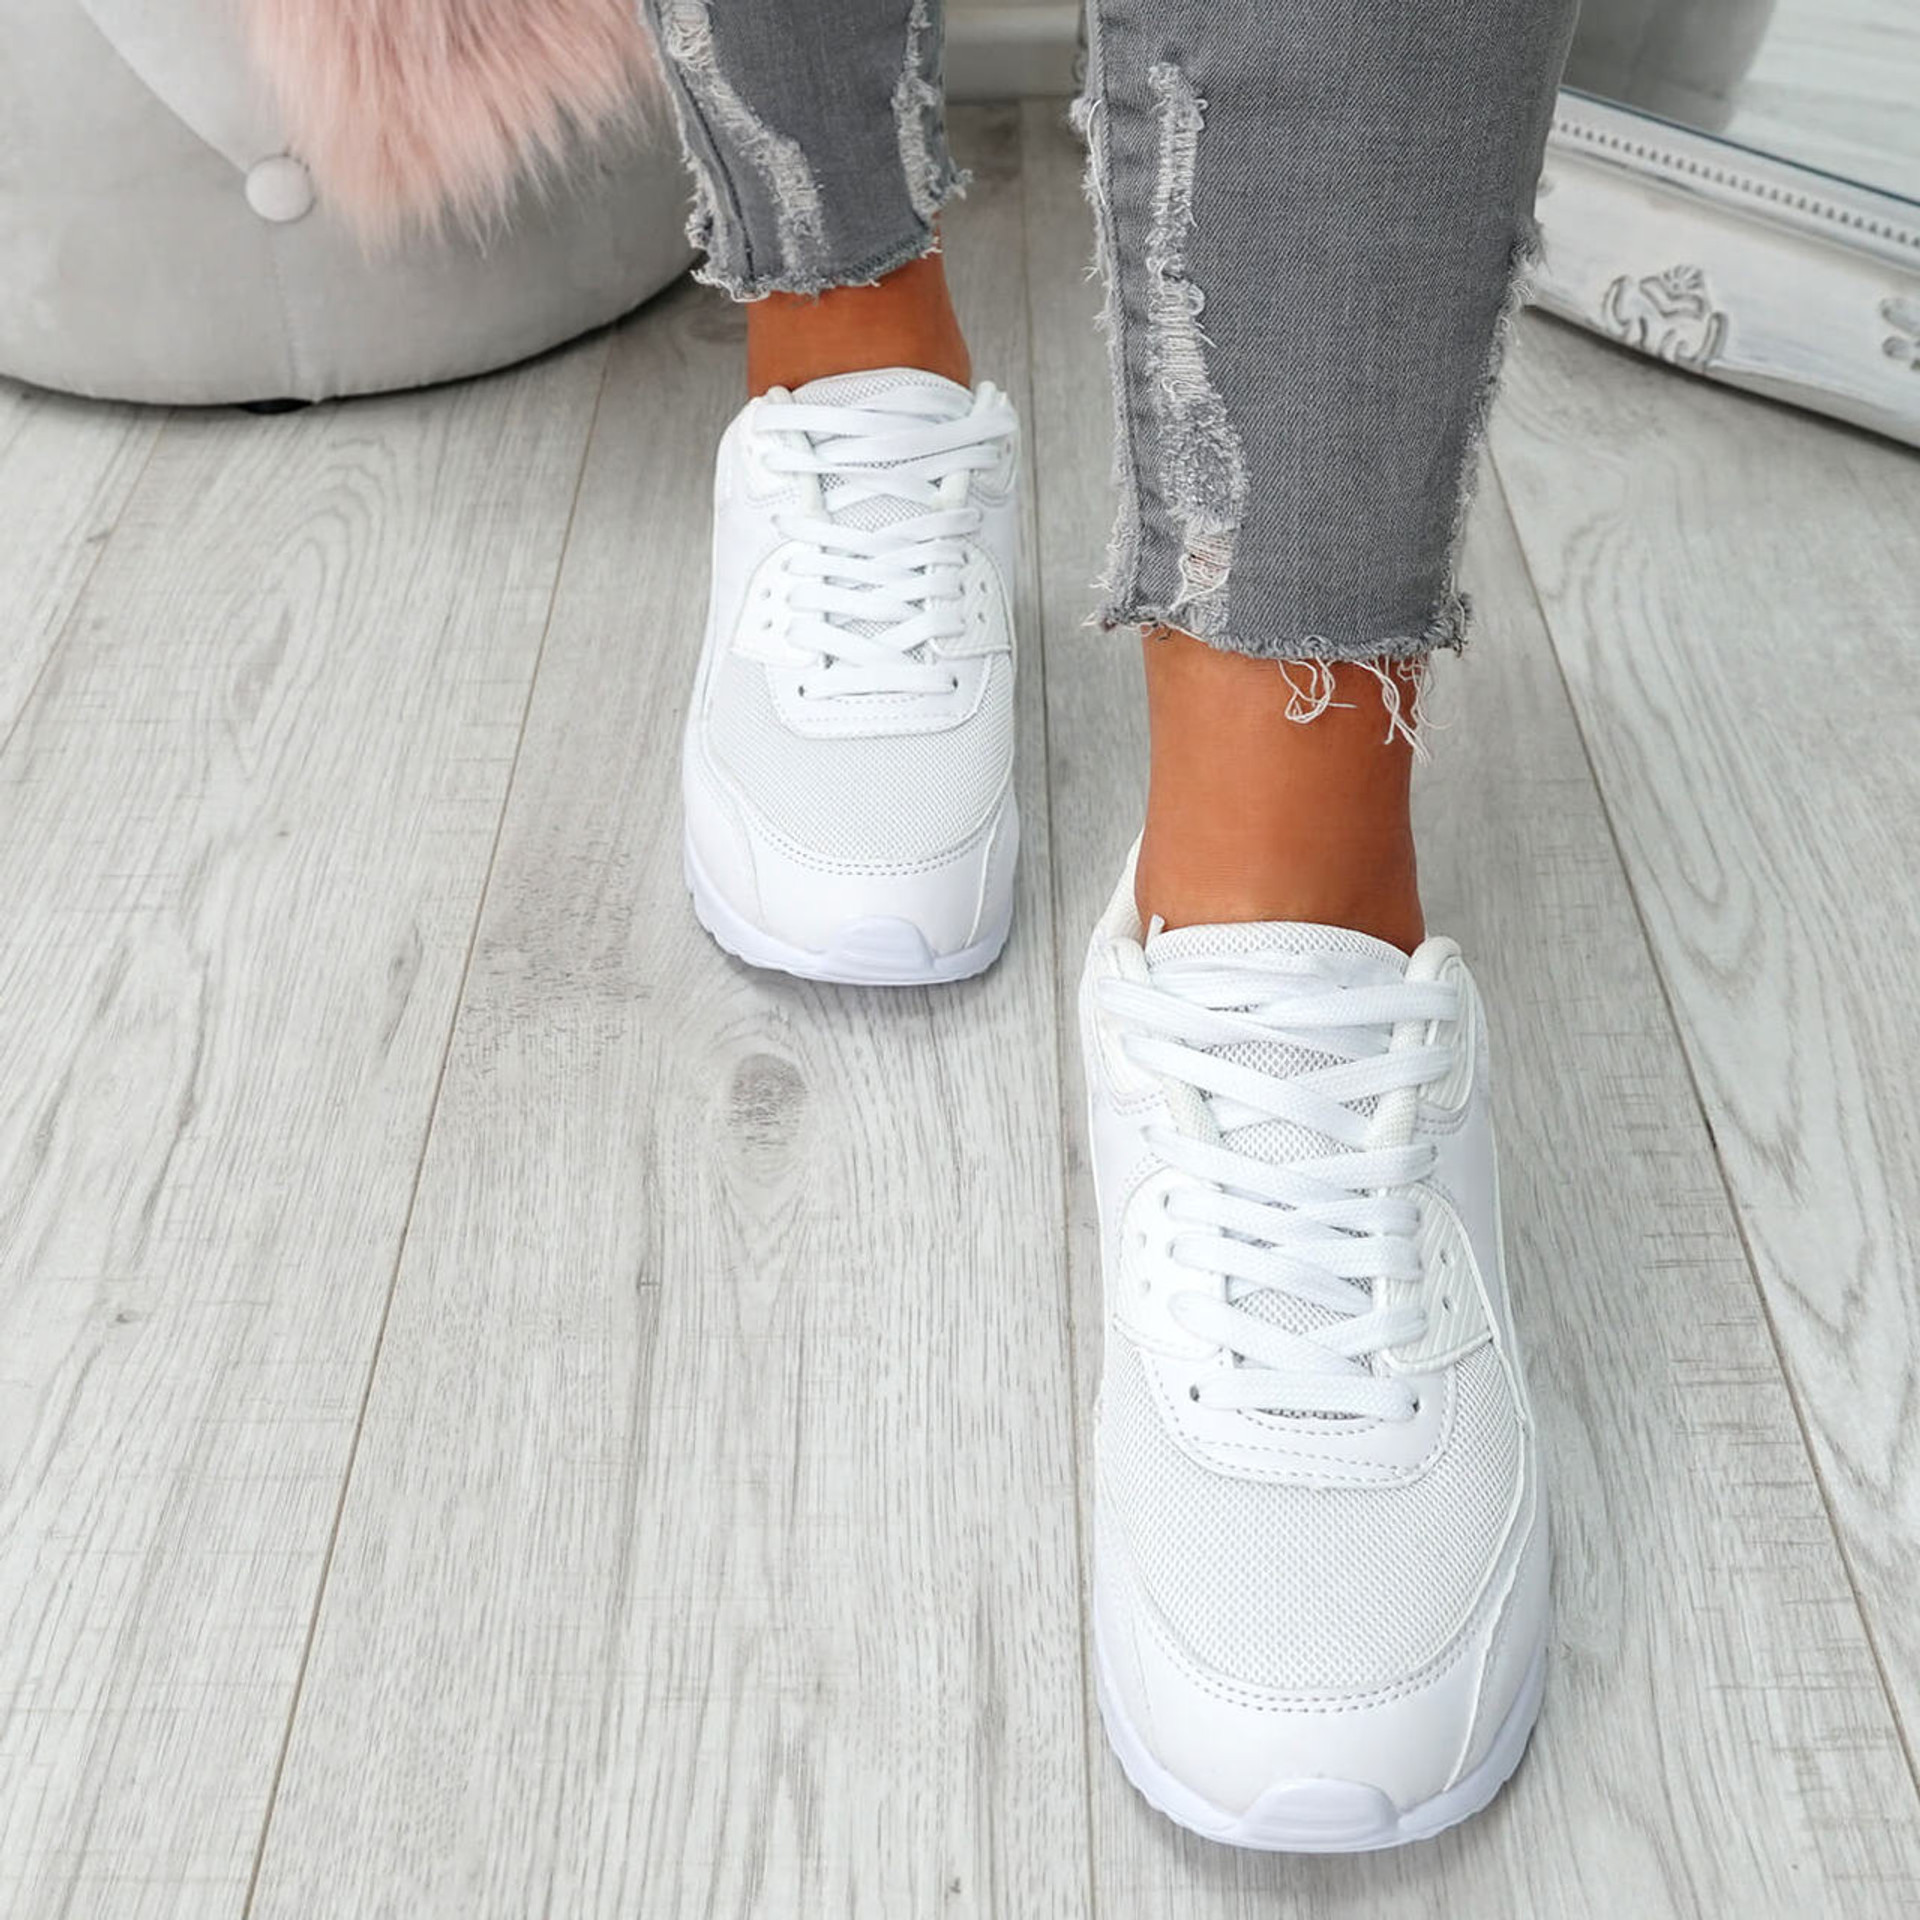 Kimsa White Lace Up Trainers